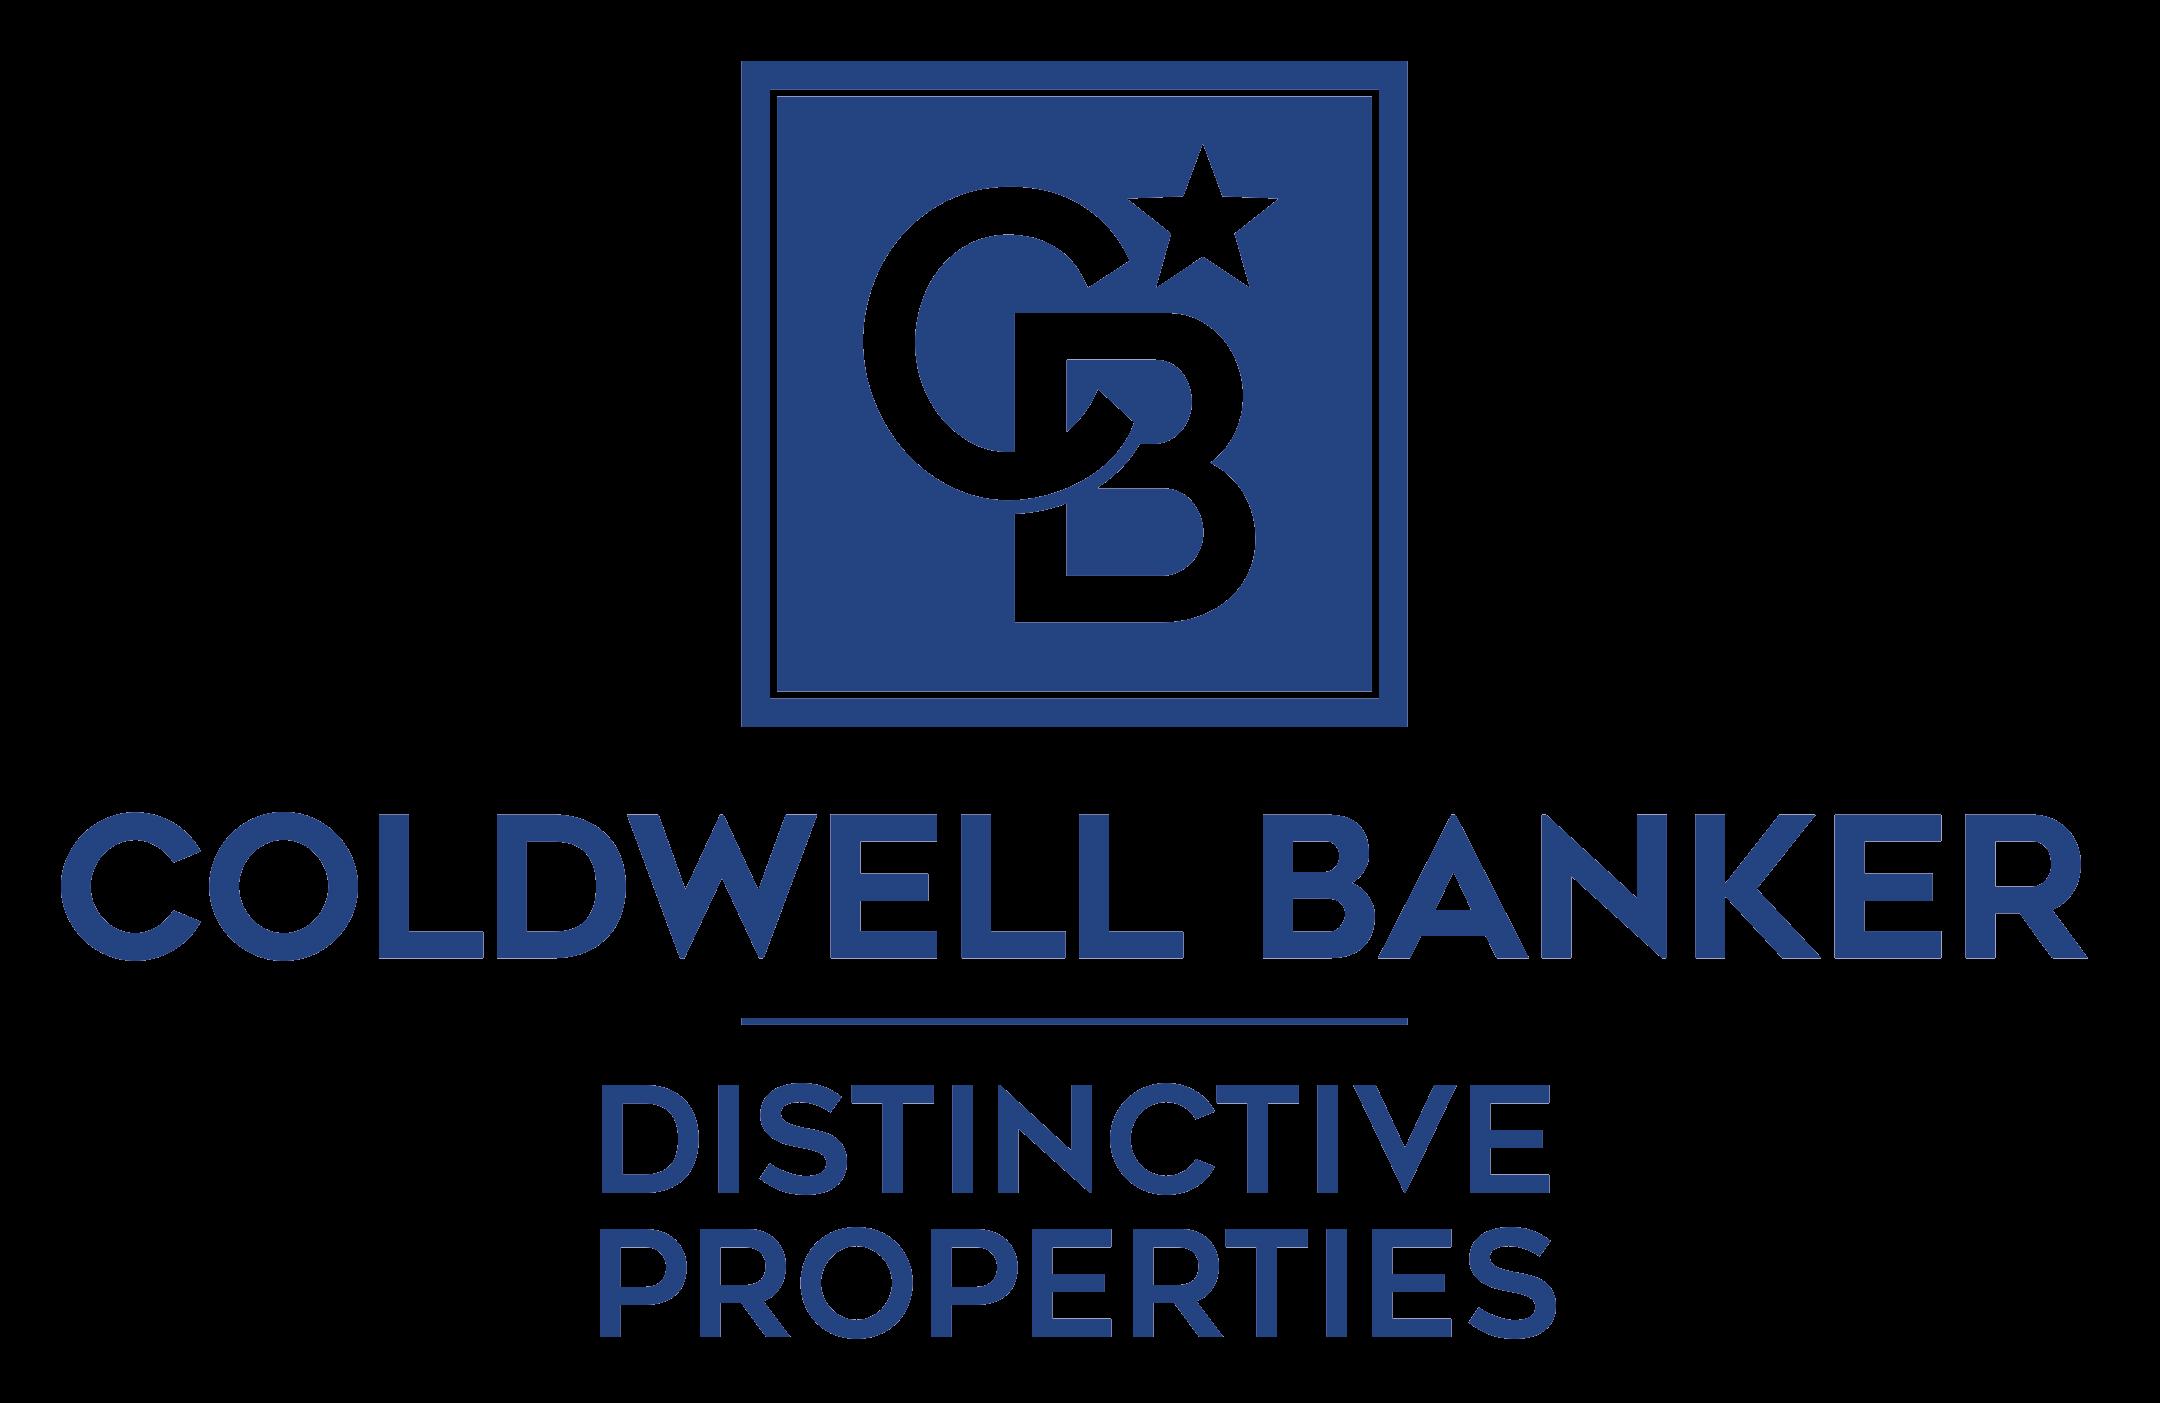 Caron Shay - Coldwell Banker Distinctive Properties Logo